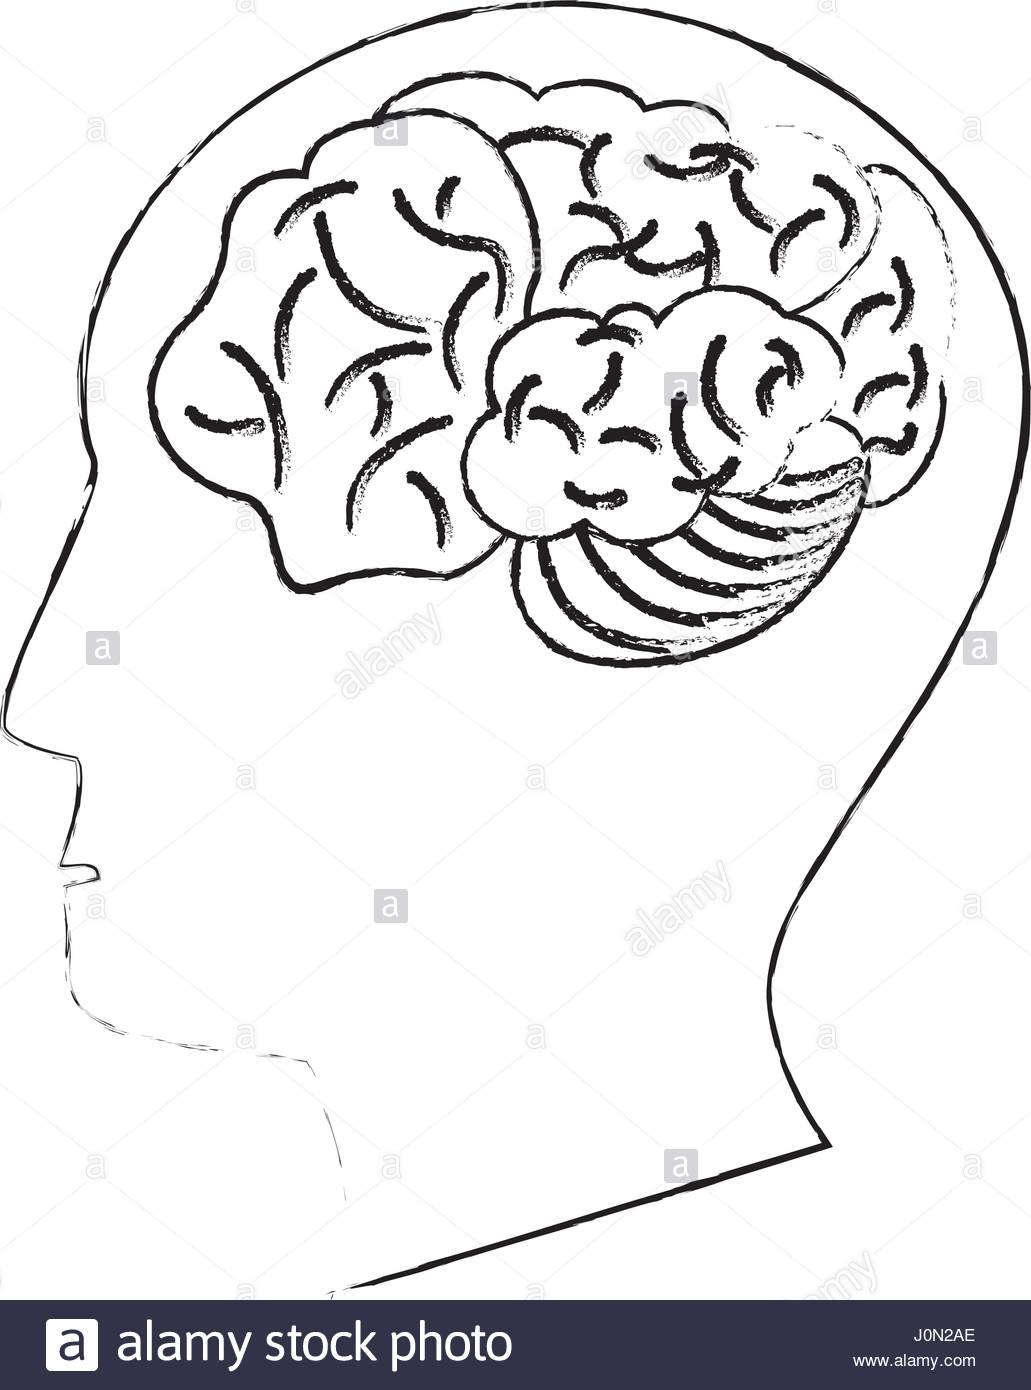 1031x1390 Head Human Brain Thinking Idea Sketch Stock Vector Art